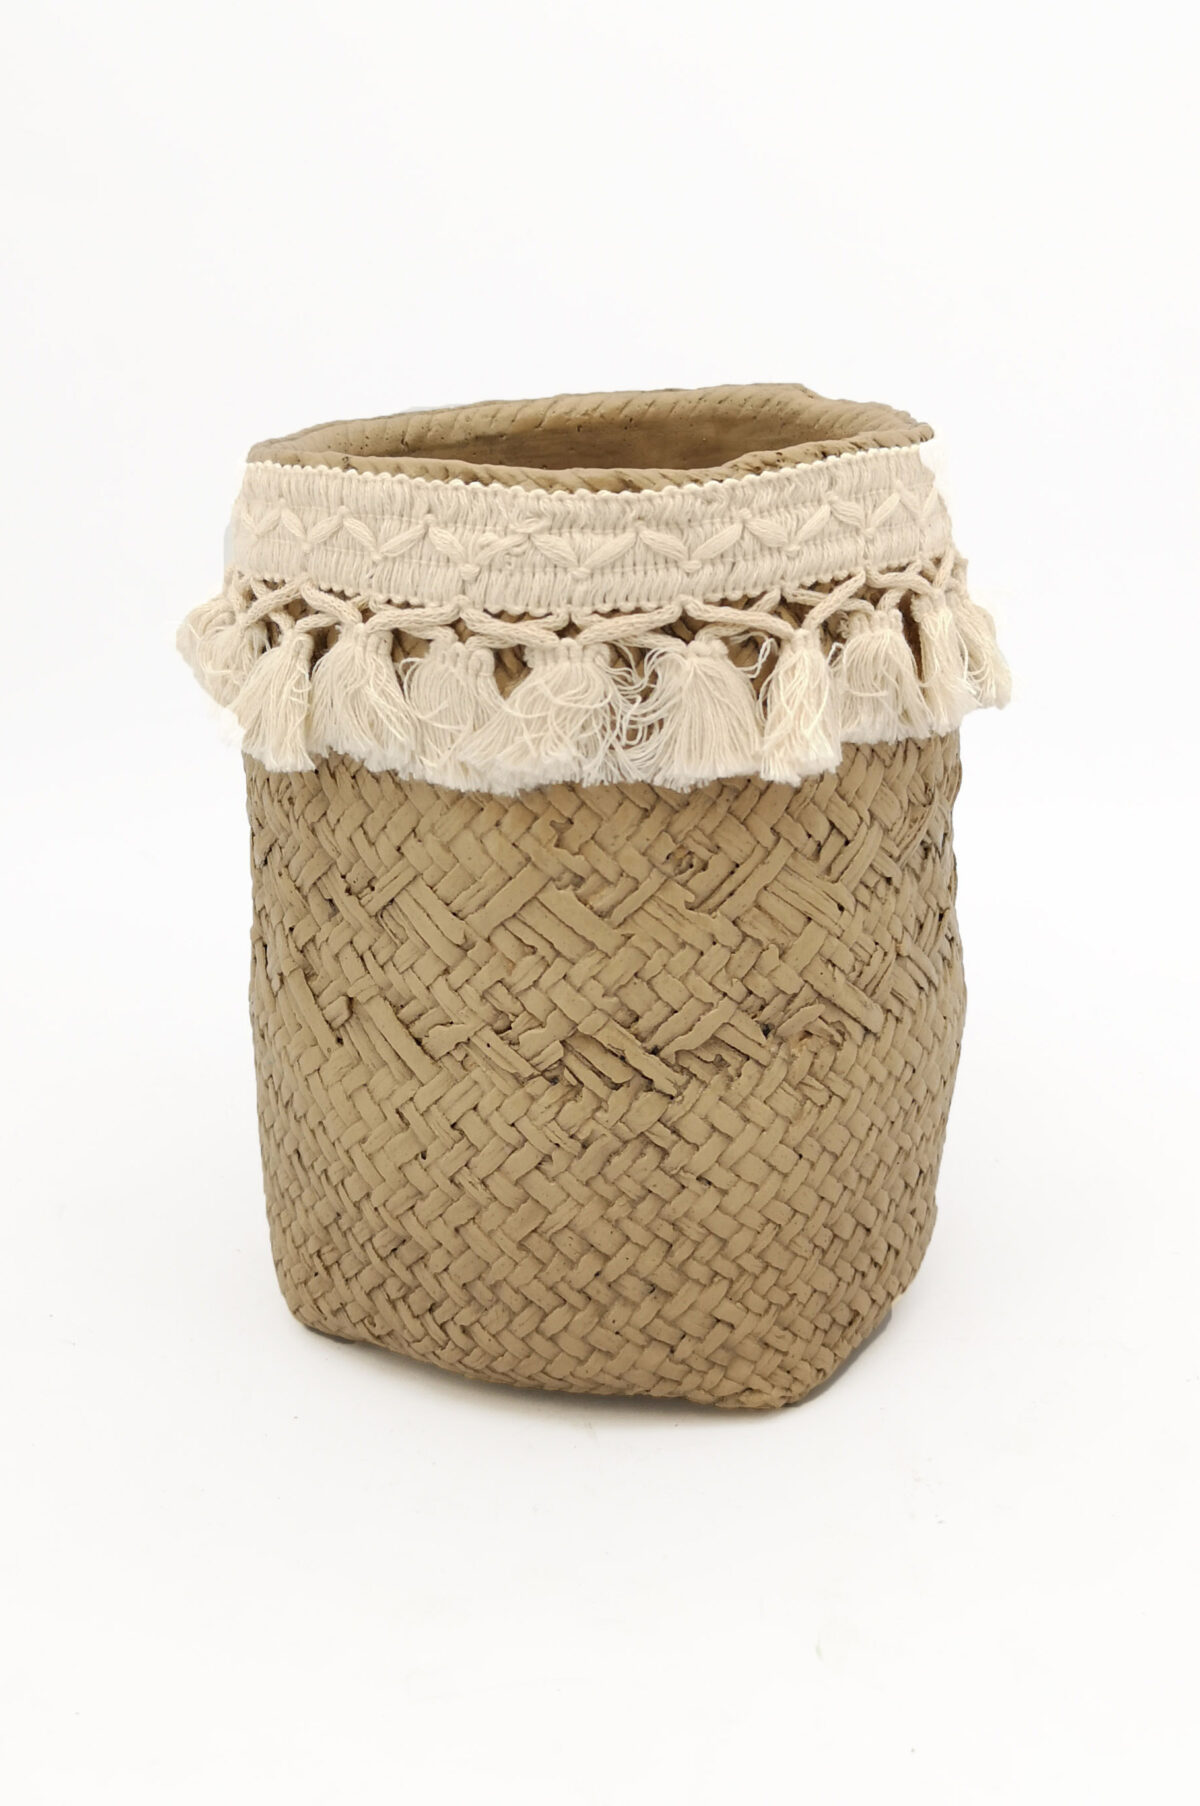 Portavaso - portapianta alto simil cesta con frange d. 17,5 h. 21,5 cm